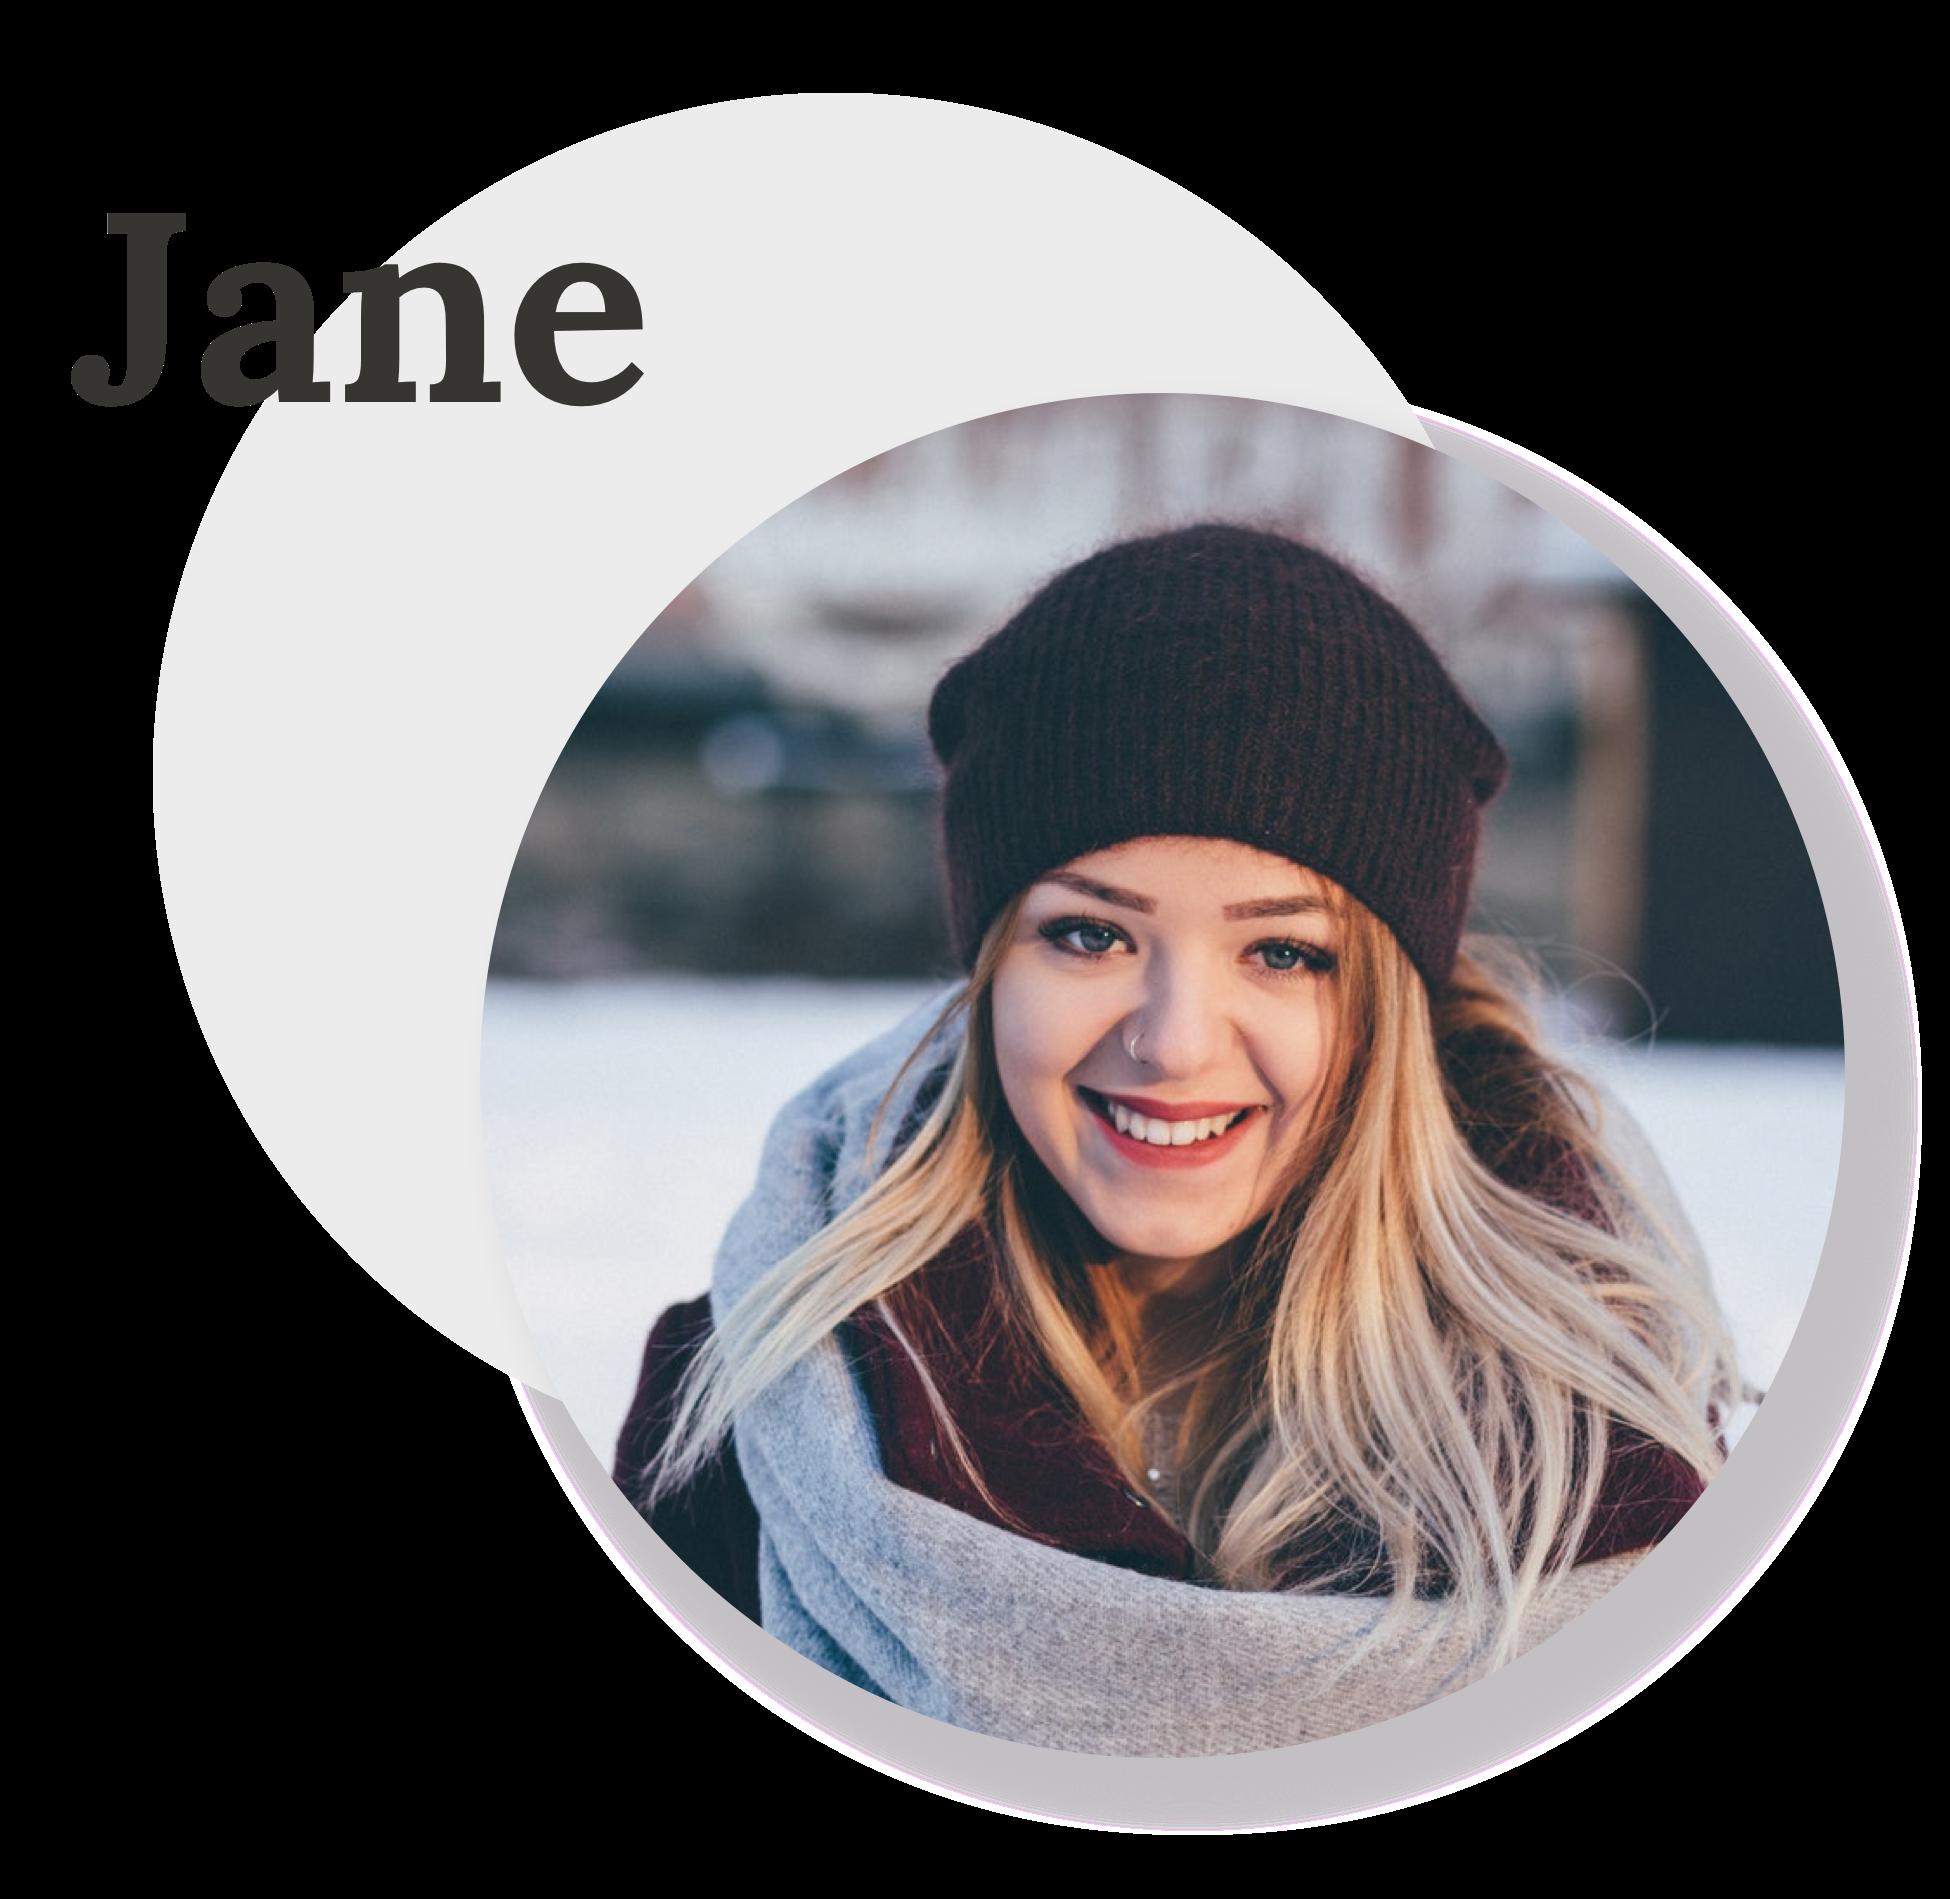 Jane Alone 2.png